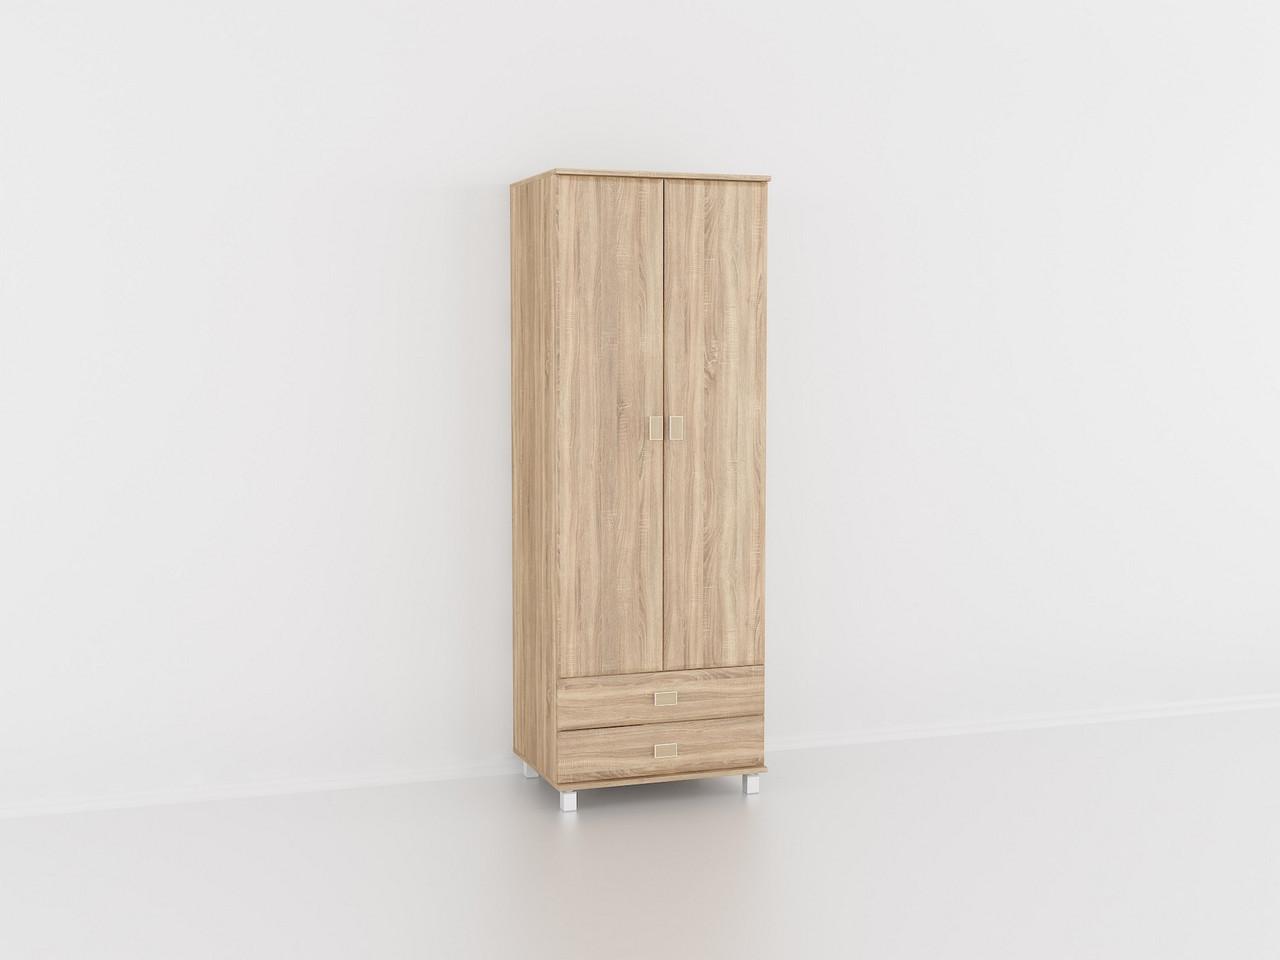 Шафа для одягу Дуб Сонома, шафа у вітальню, залу. Меблі з МДФ